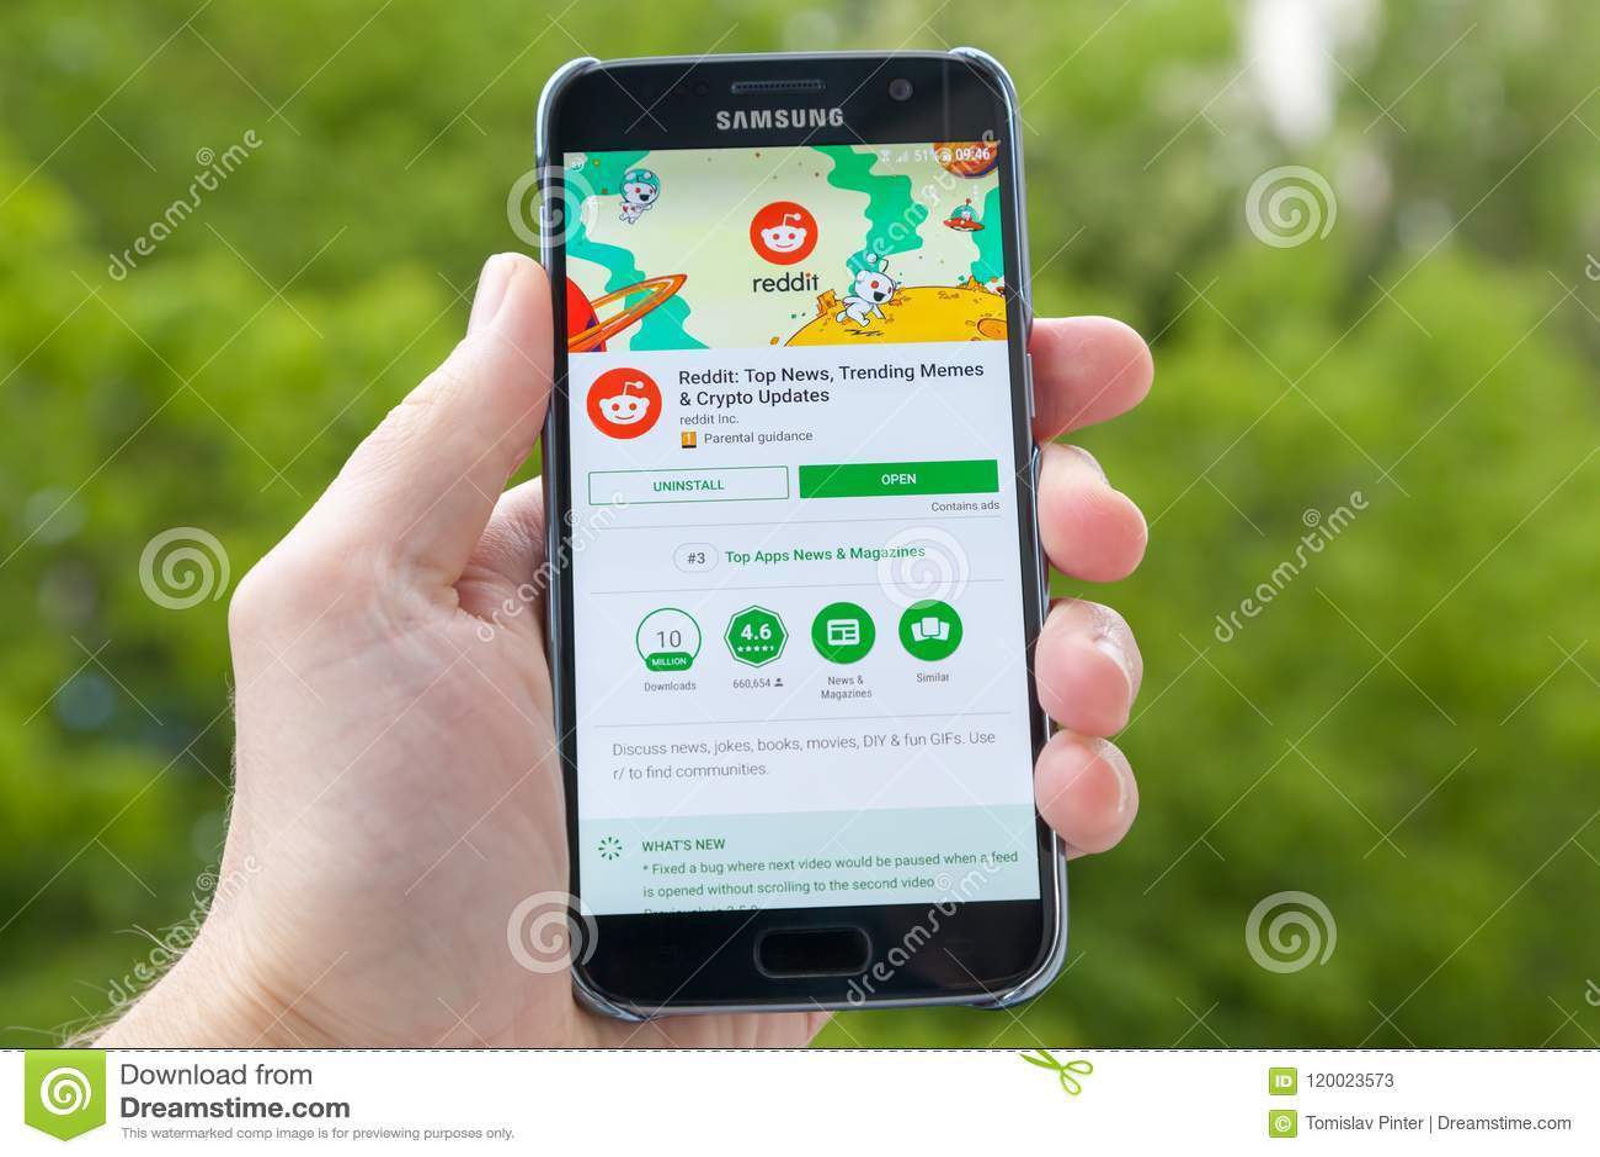 Reddit on smartphone editorial stock photo  Image of display